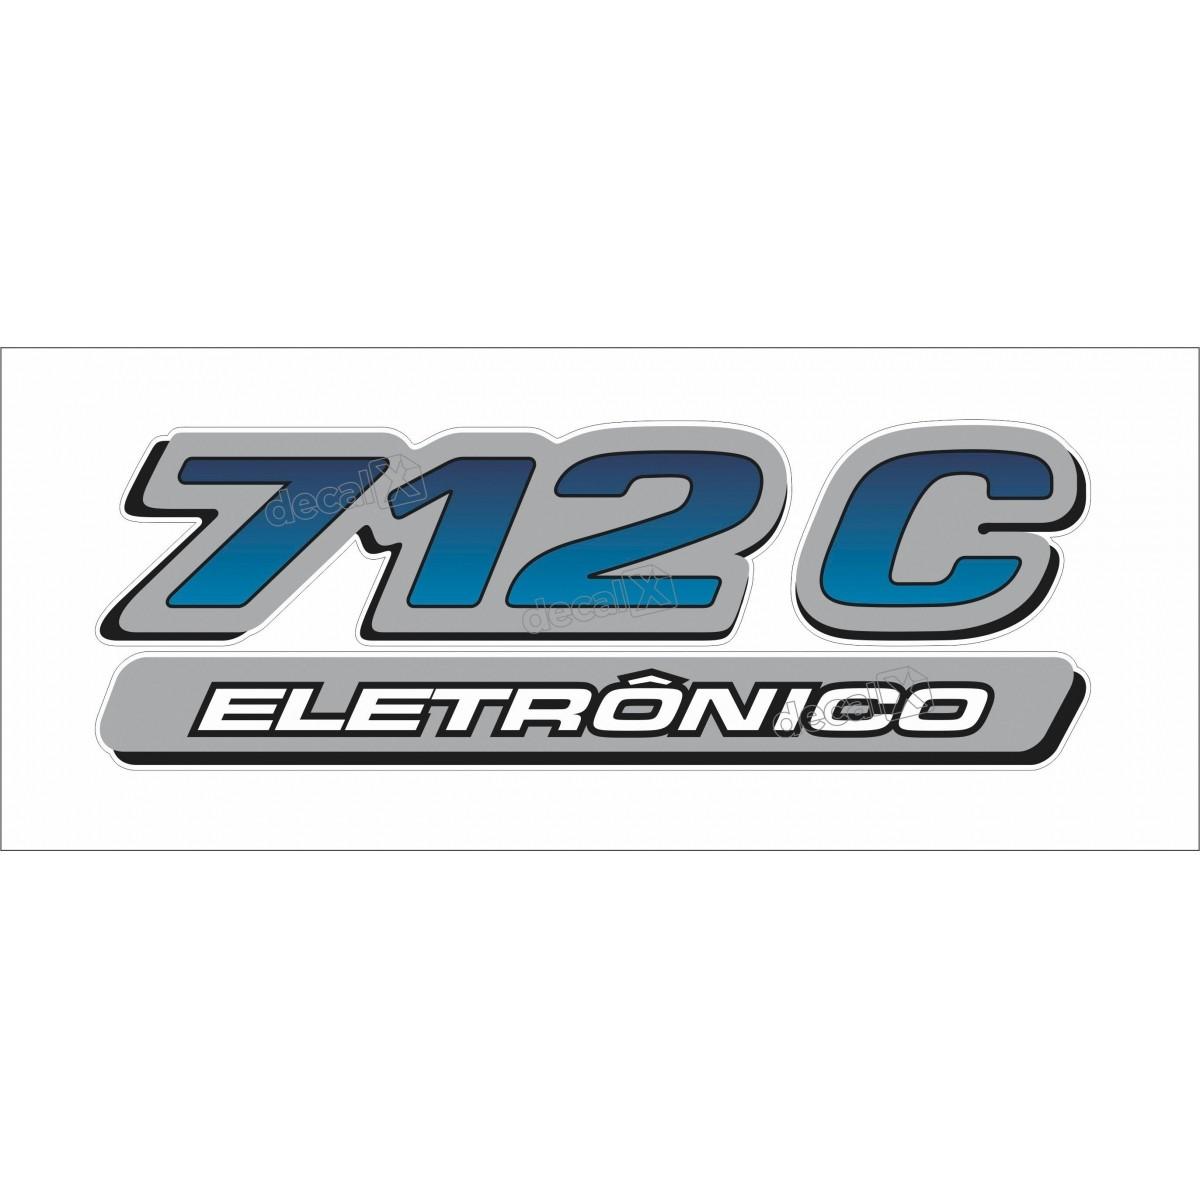 Adesivo Emblema Mercedes 712c Eletronico Cm109